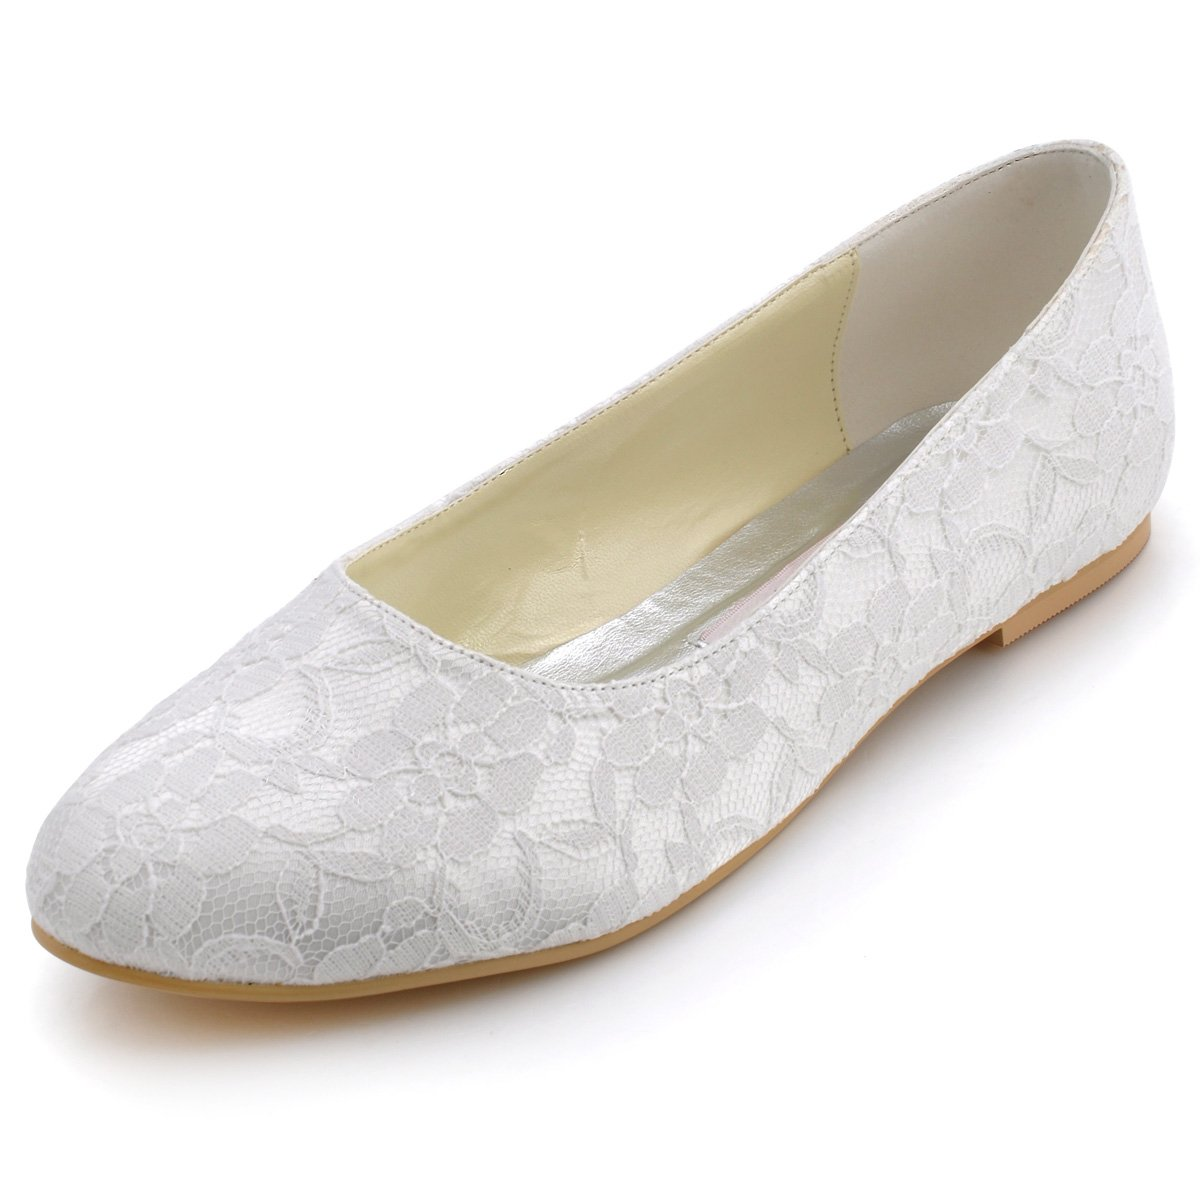 ElegantPark EP11106 Women Comfort Flats Closed Toe Lace Wedding Bridal Shoes Ivory US 8